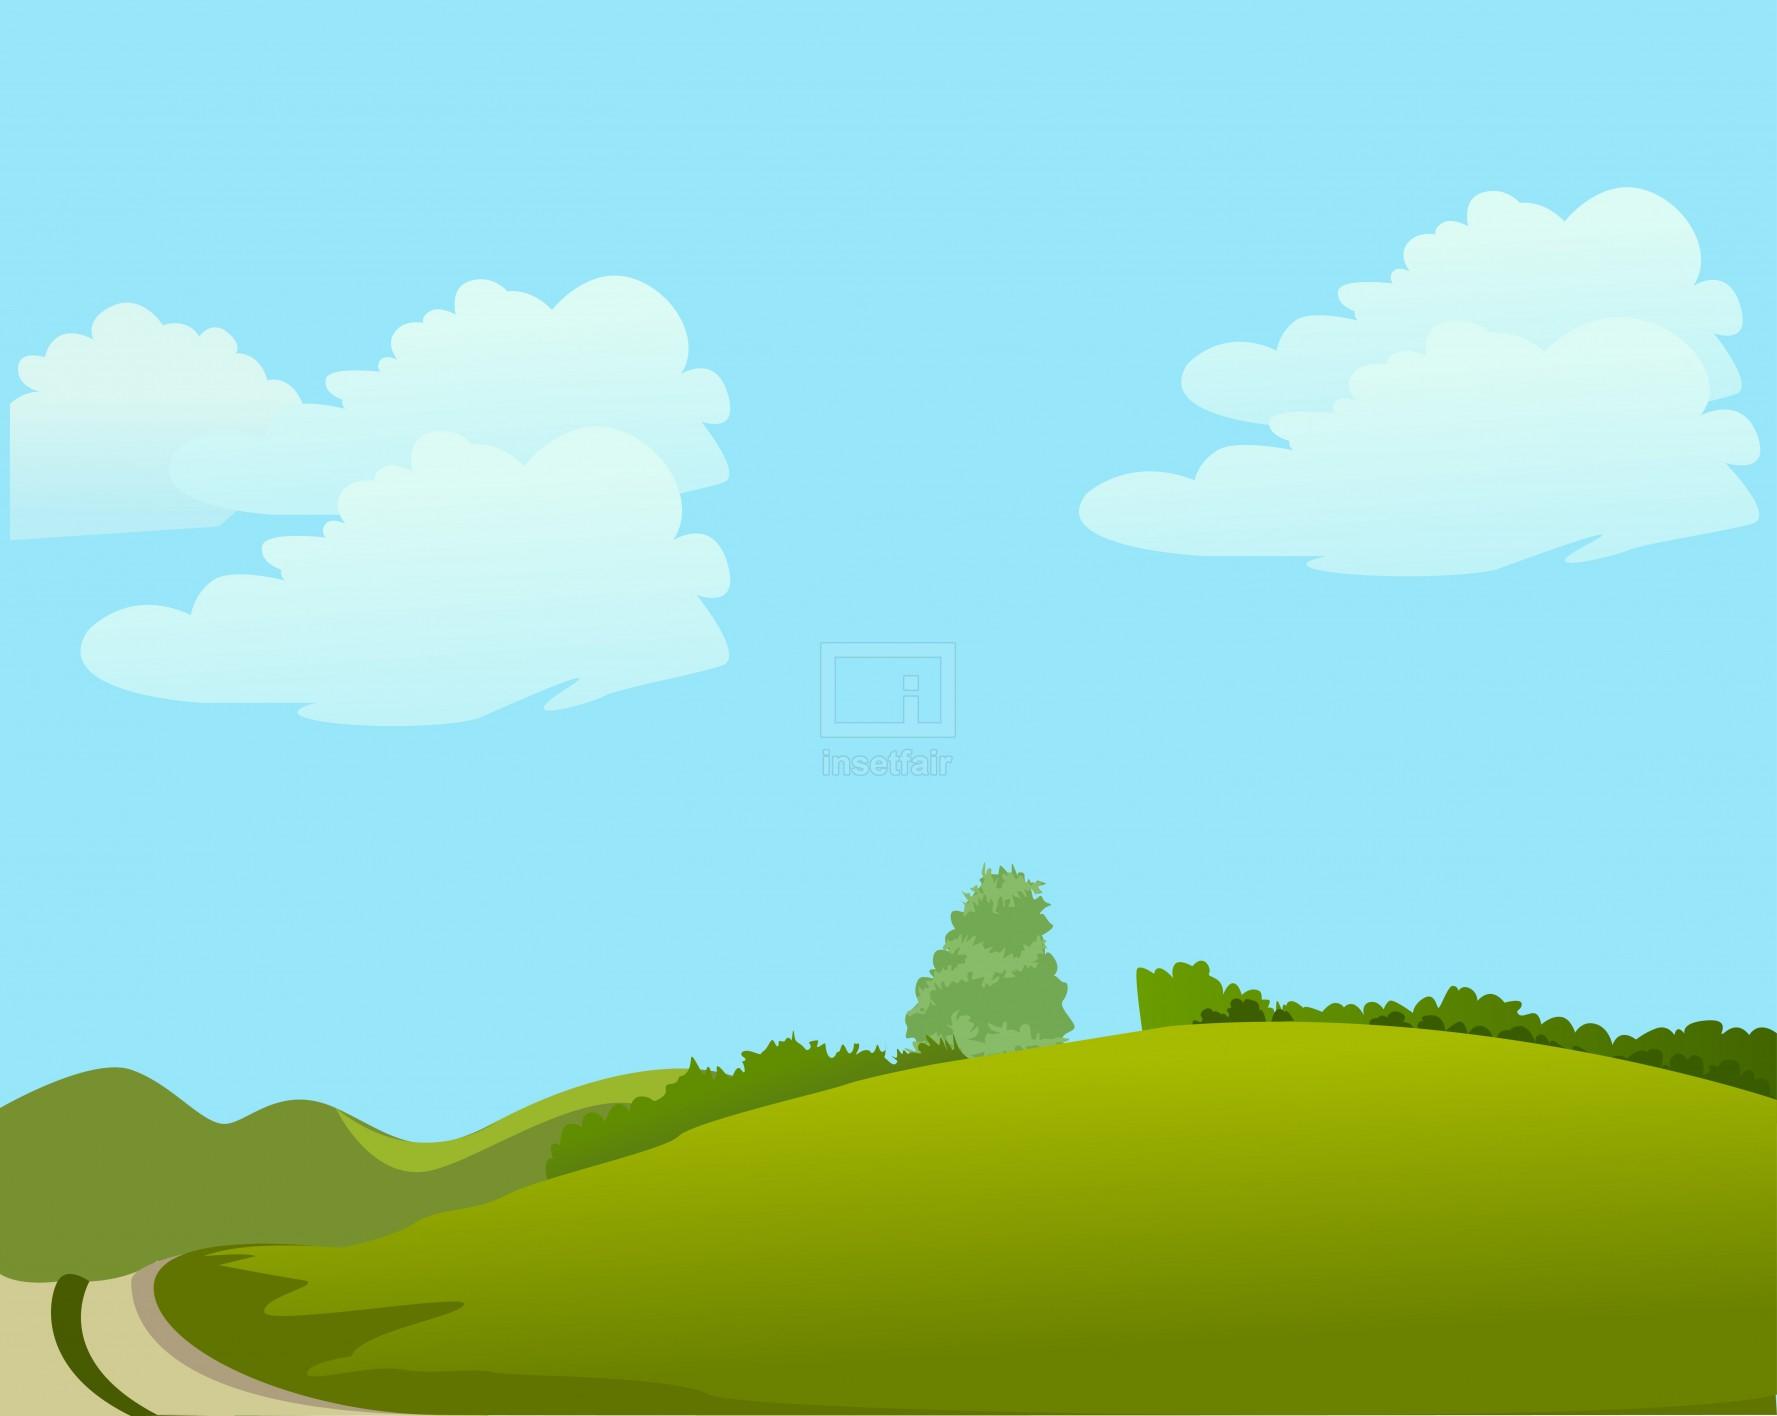 Hot summer season blue sky vector illustration AI source file free download